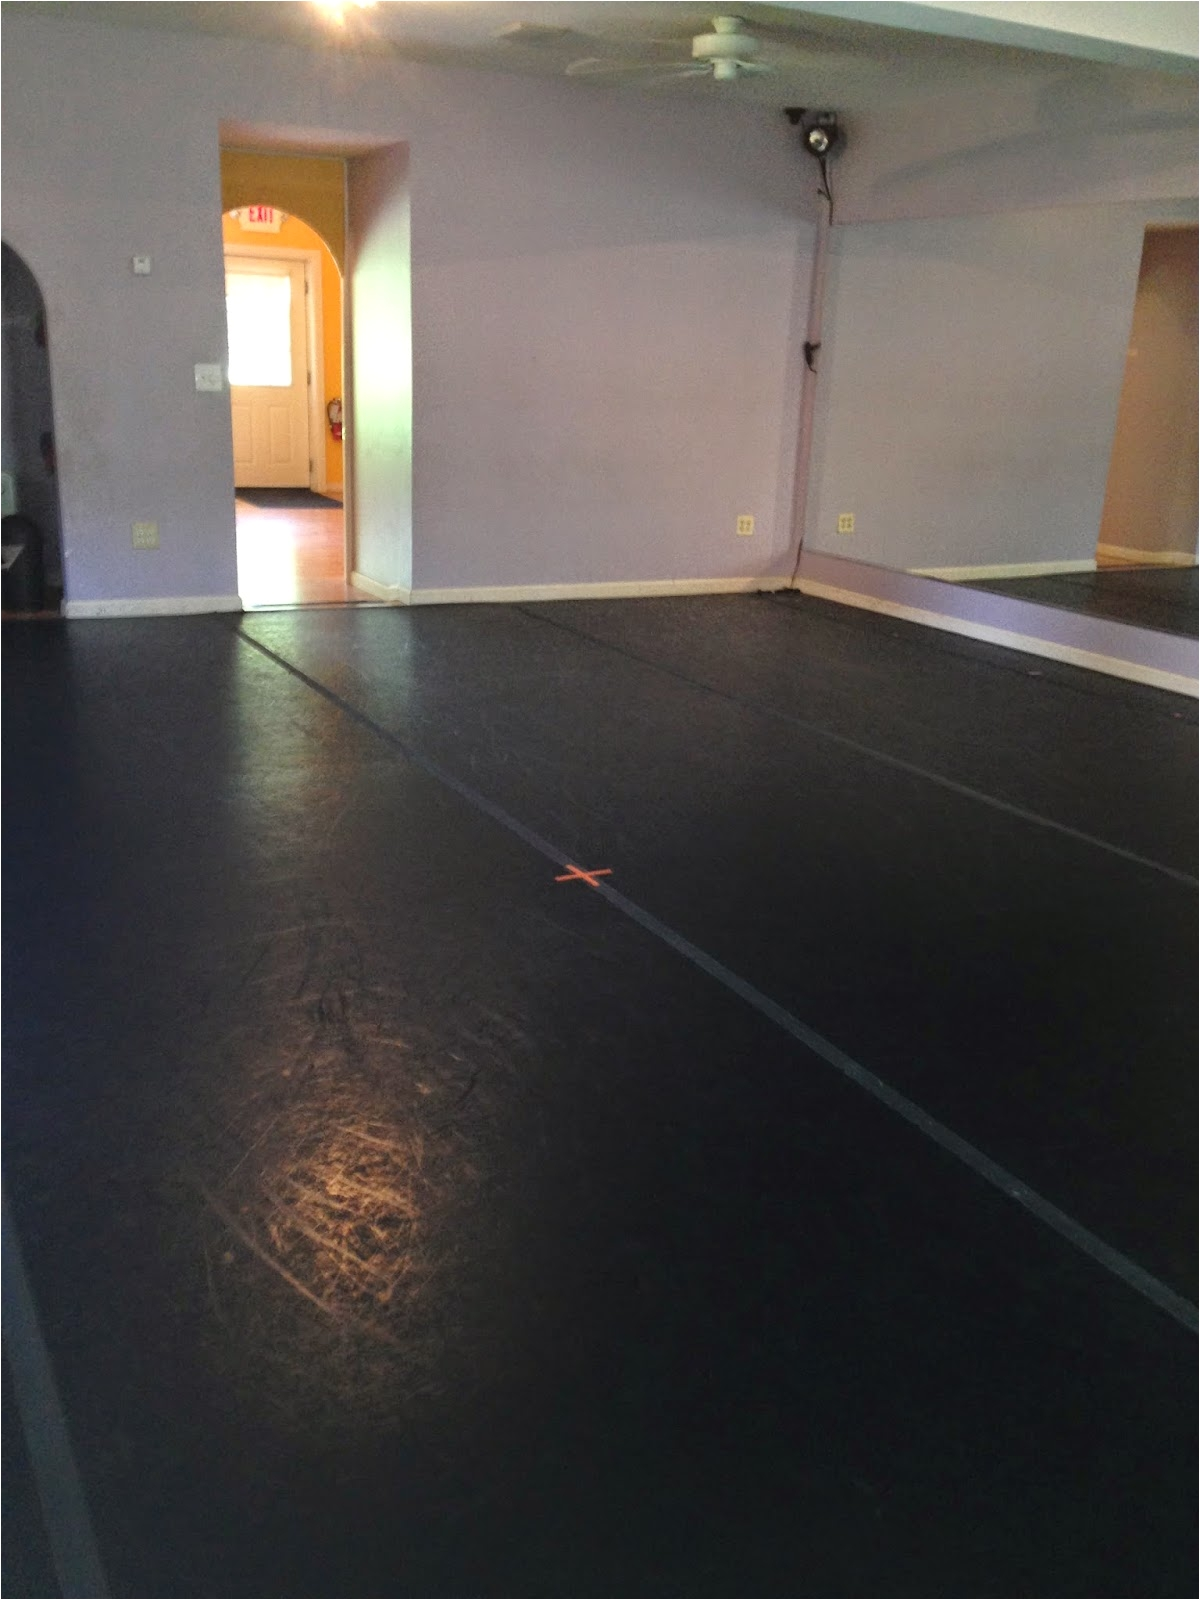 Rosco Adagio tour Dance Floor Greatmats Specialty Flooring Mats and Tiles July Marley Dance